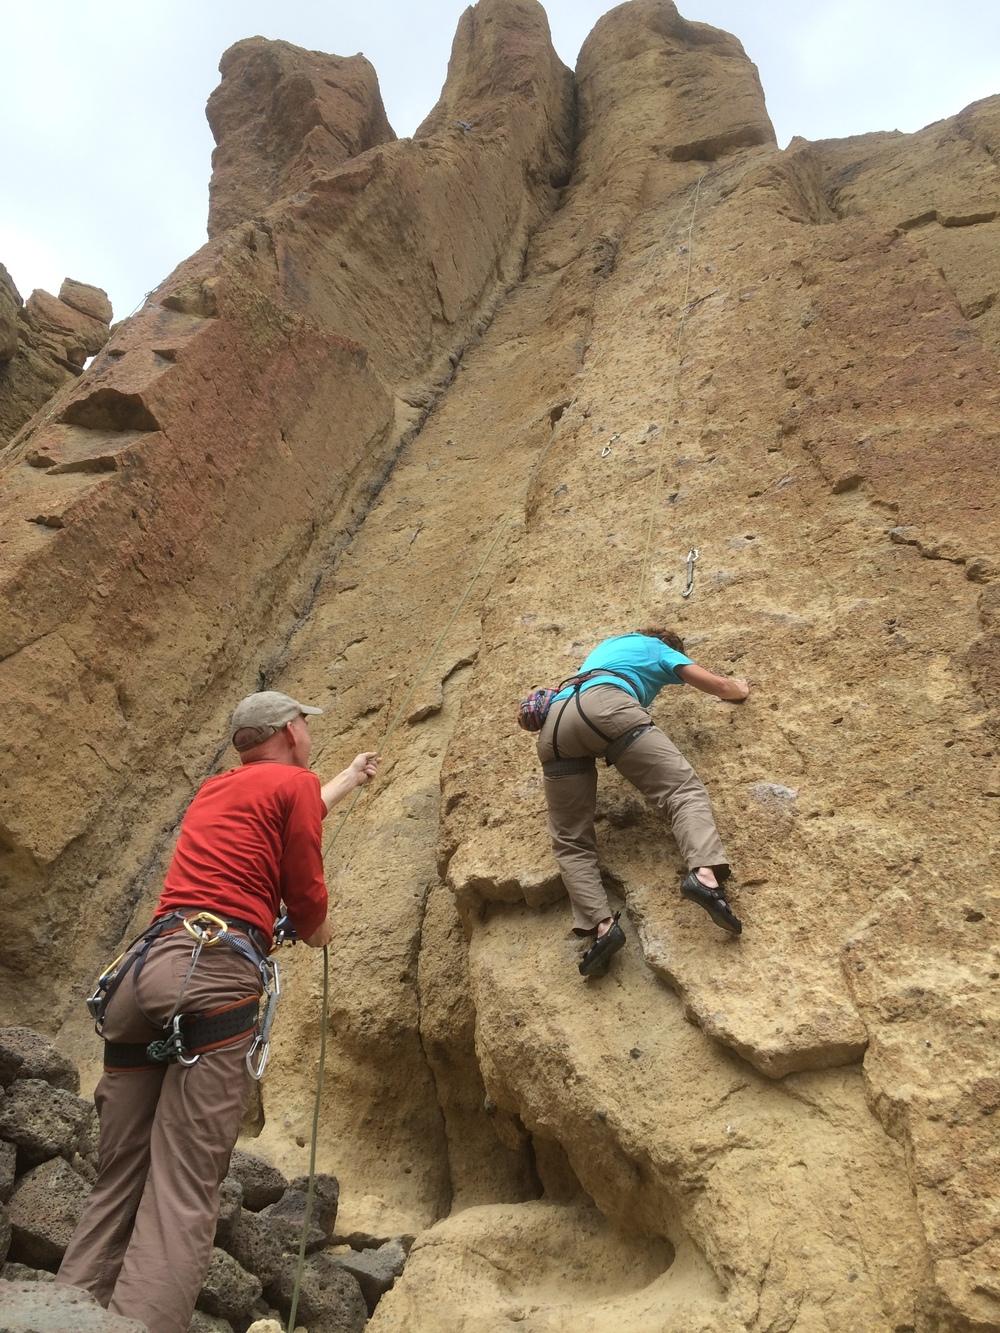 Brandon's Dad belaying Asam at Smith Rock